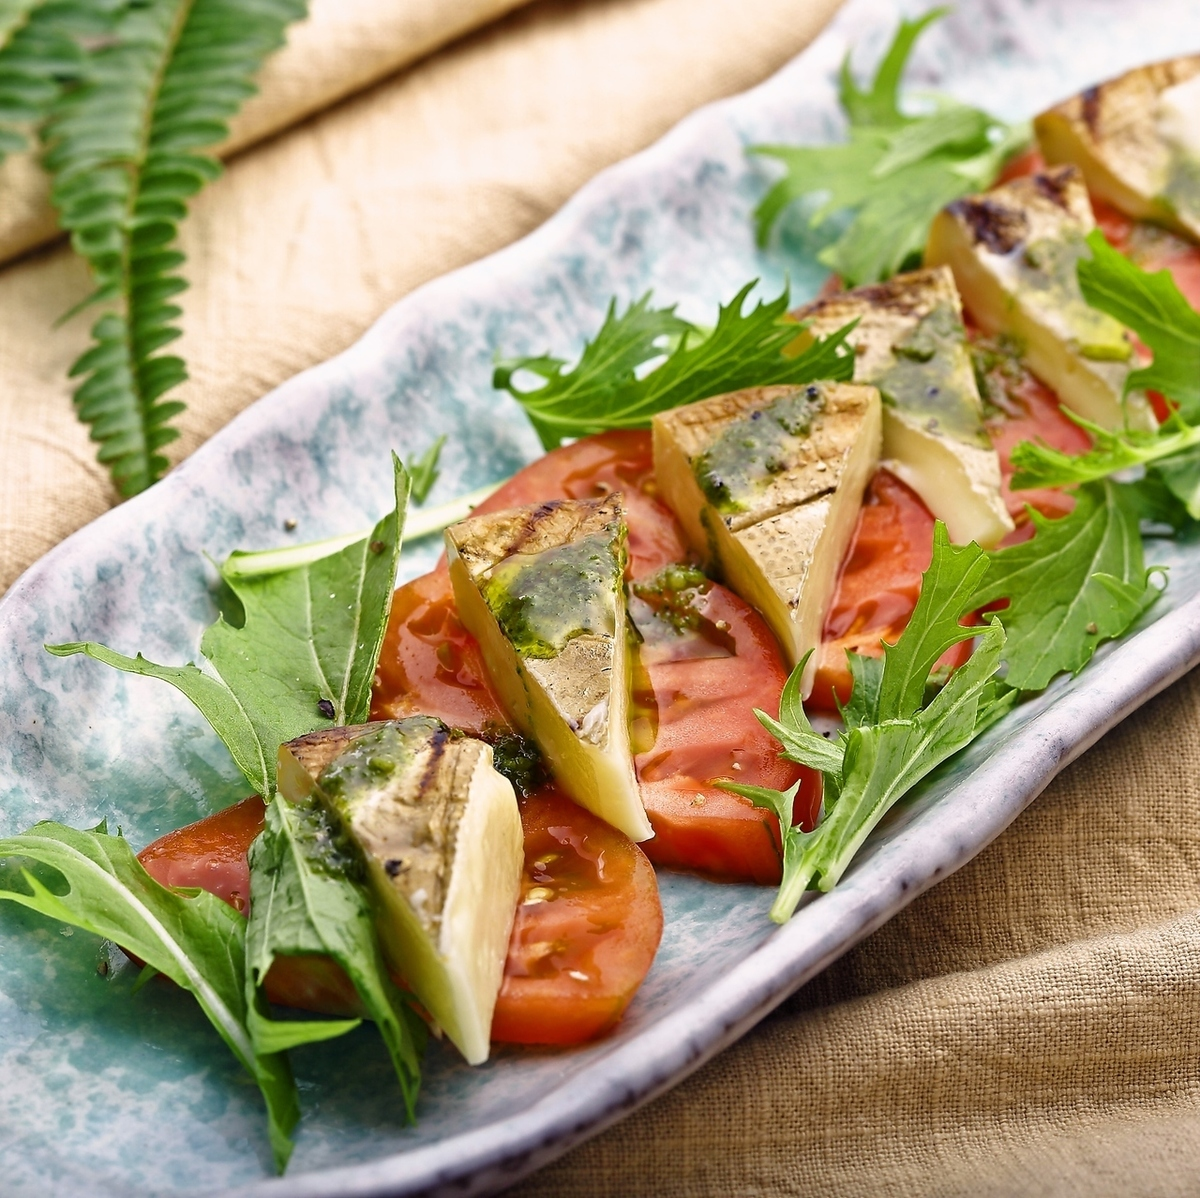 Caprese水果番茄和淀粉卡门培尔奶酪